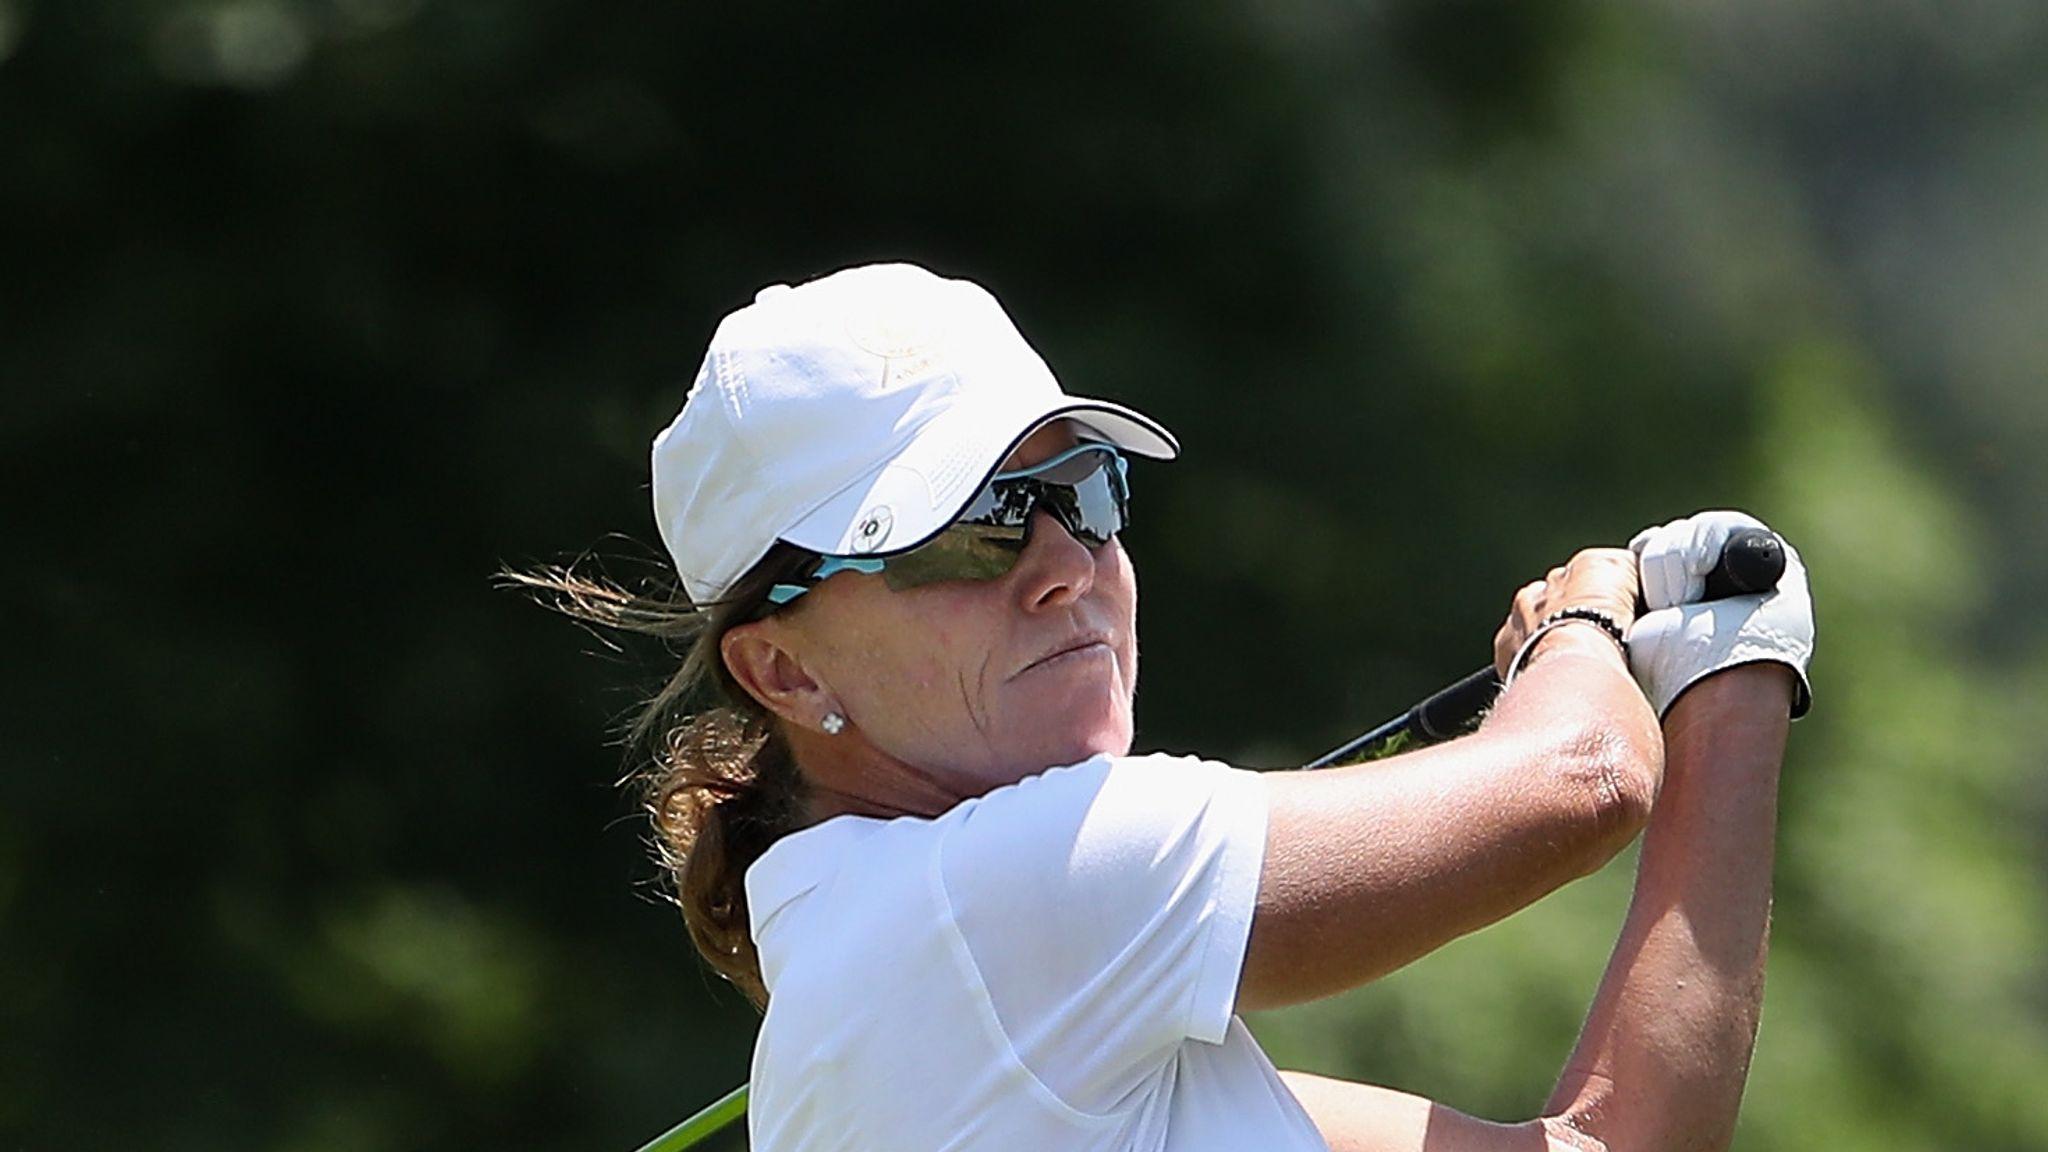 Lee Ann Walker accepts blame for 58-shot penalty at Senior LPGA